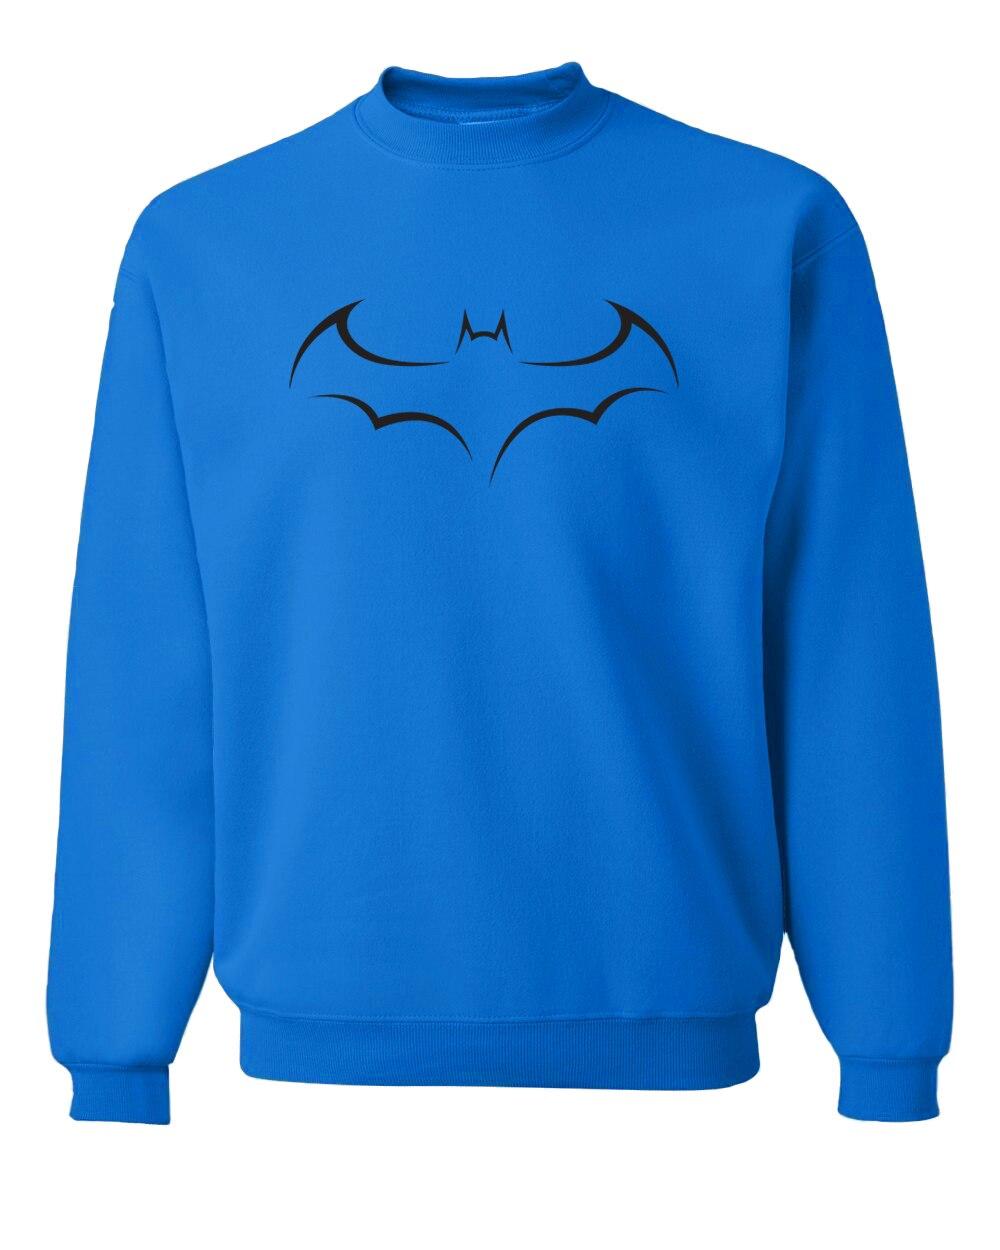 men hipster fleece o-neck tracksuits batman  printed black sweatshirts hip-hop bodybuilding hoodies homme 2019 fall winter